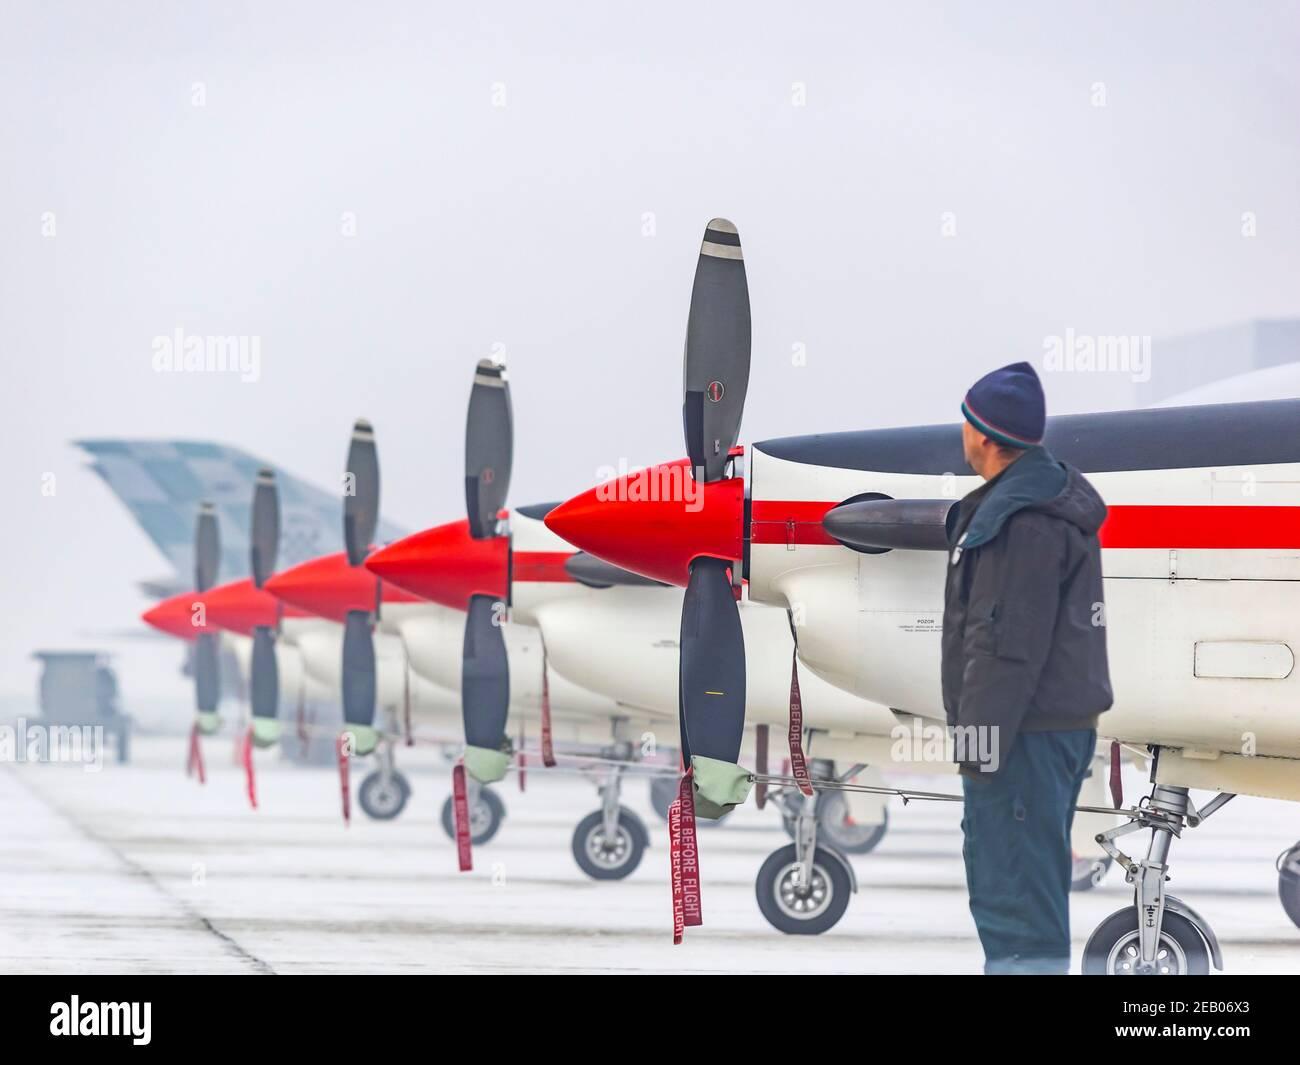 Croatian Pilatus PC-9 of Krila oluje Wings of storm aerobatic group Stock Photo